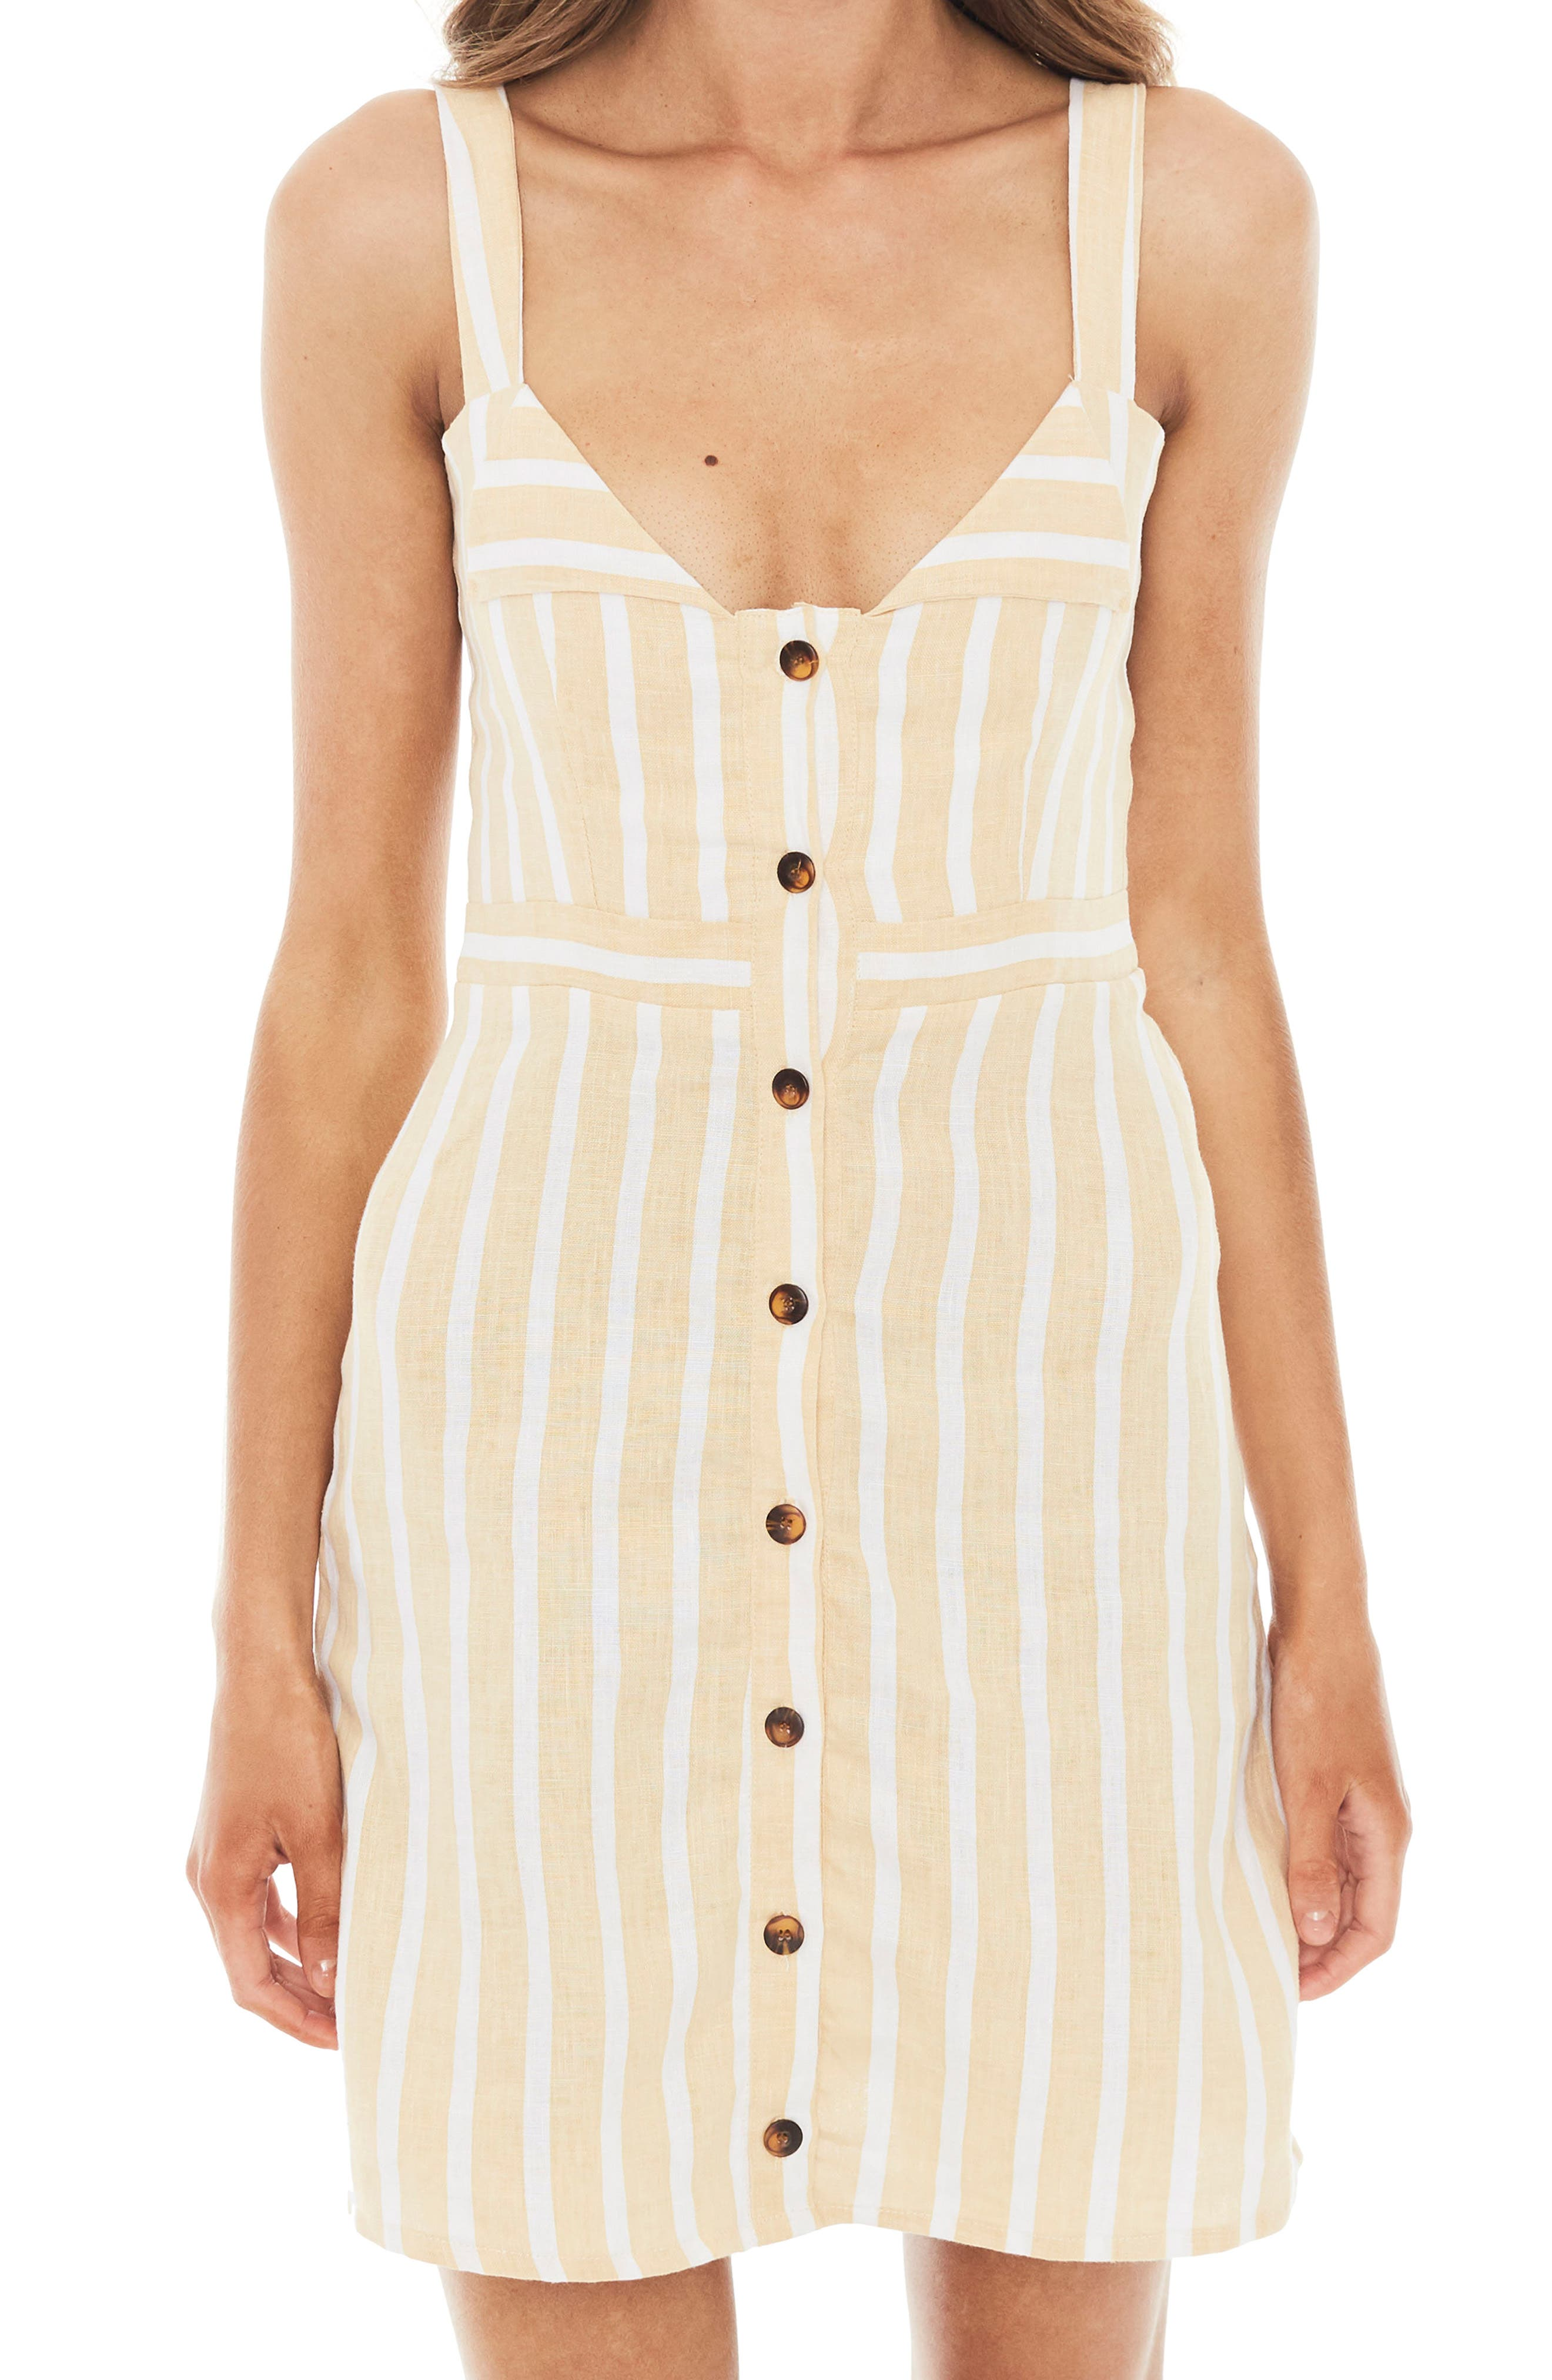 Le Petite Stripe Linen Dress,                             Alternate thumbnail 4, color,                             MAZUR STRIPE PRINT - LEMON